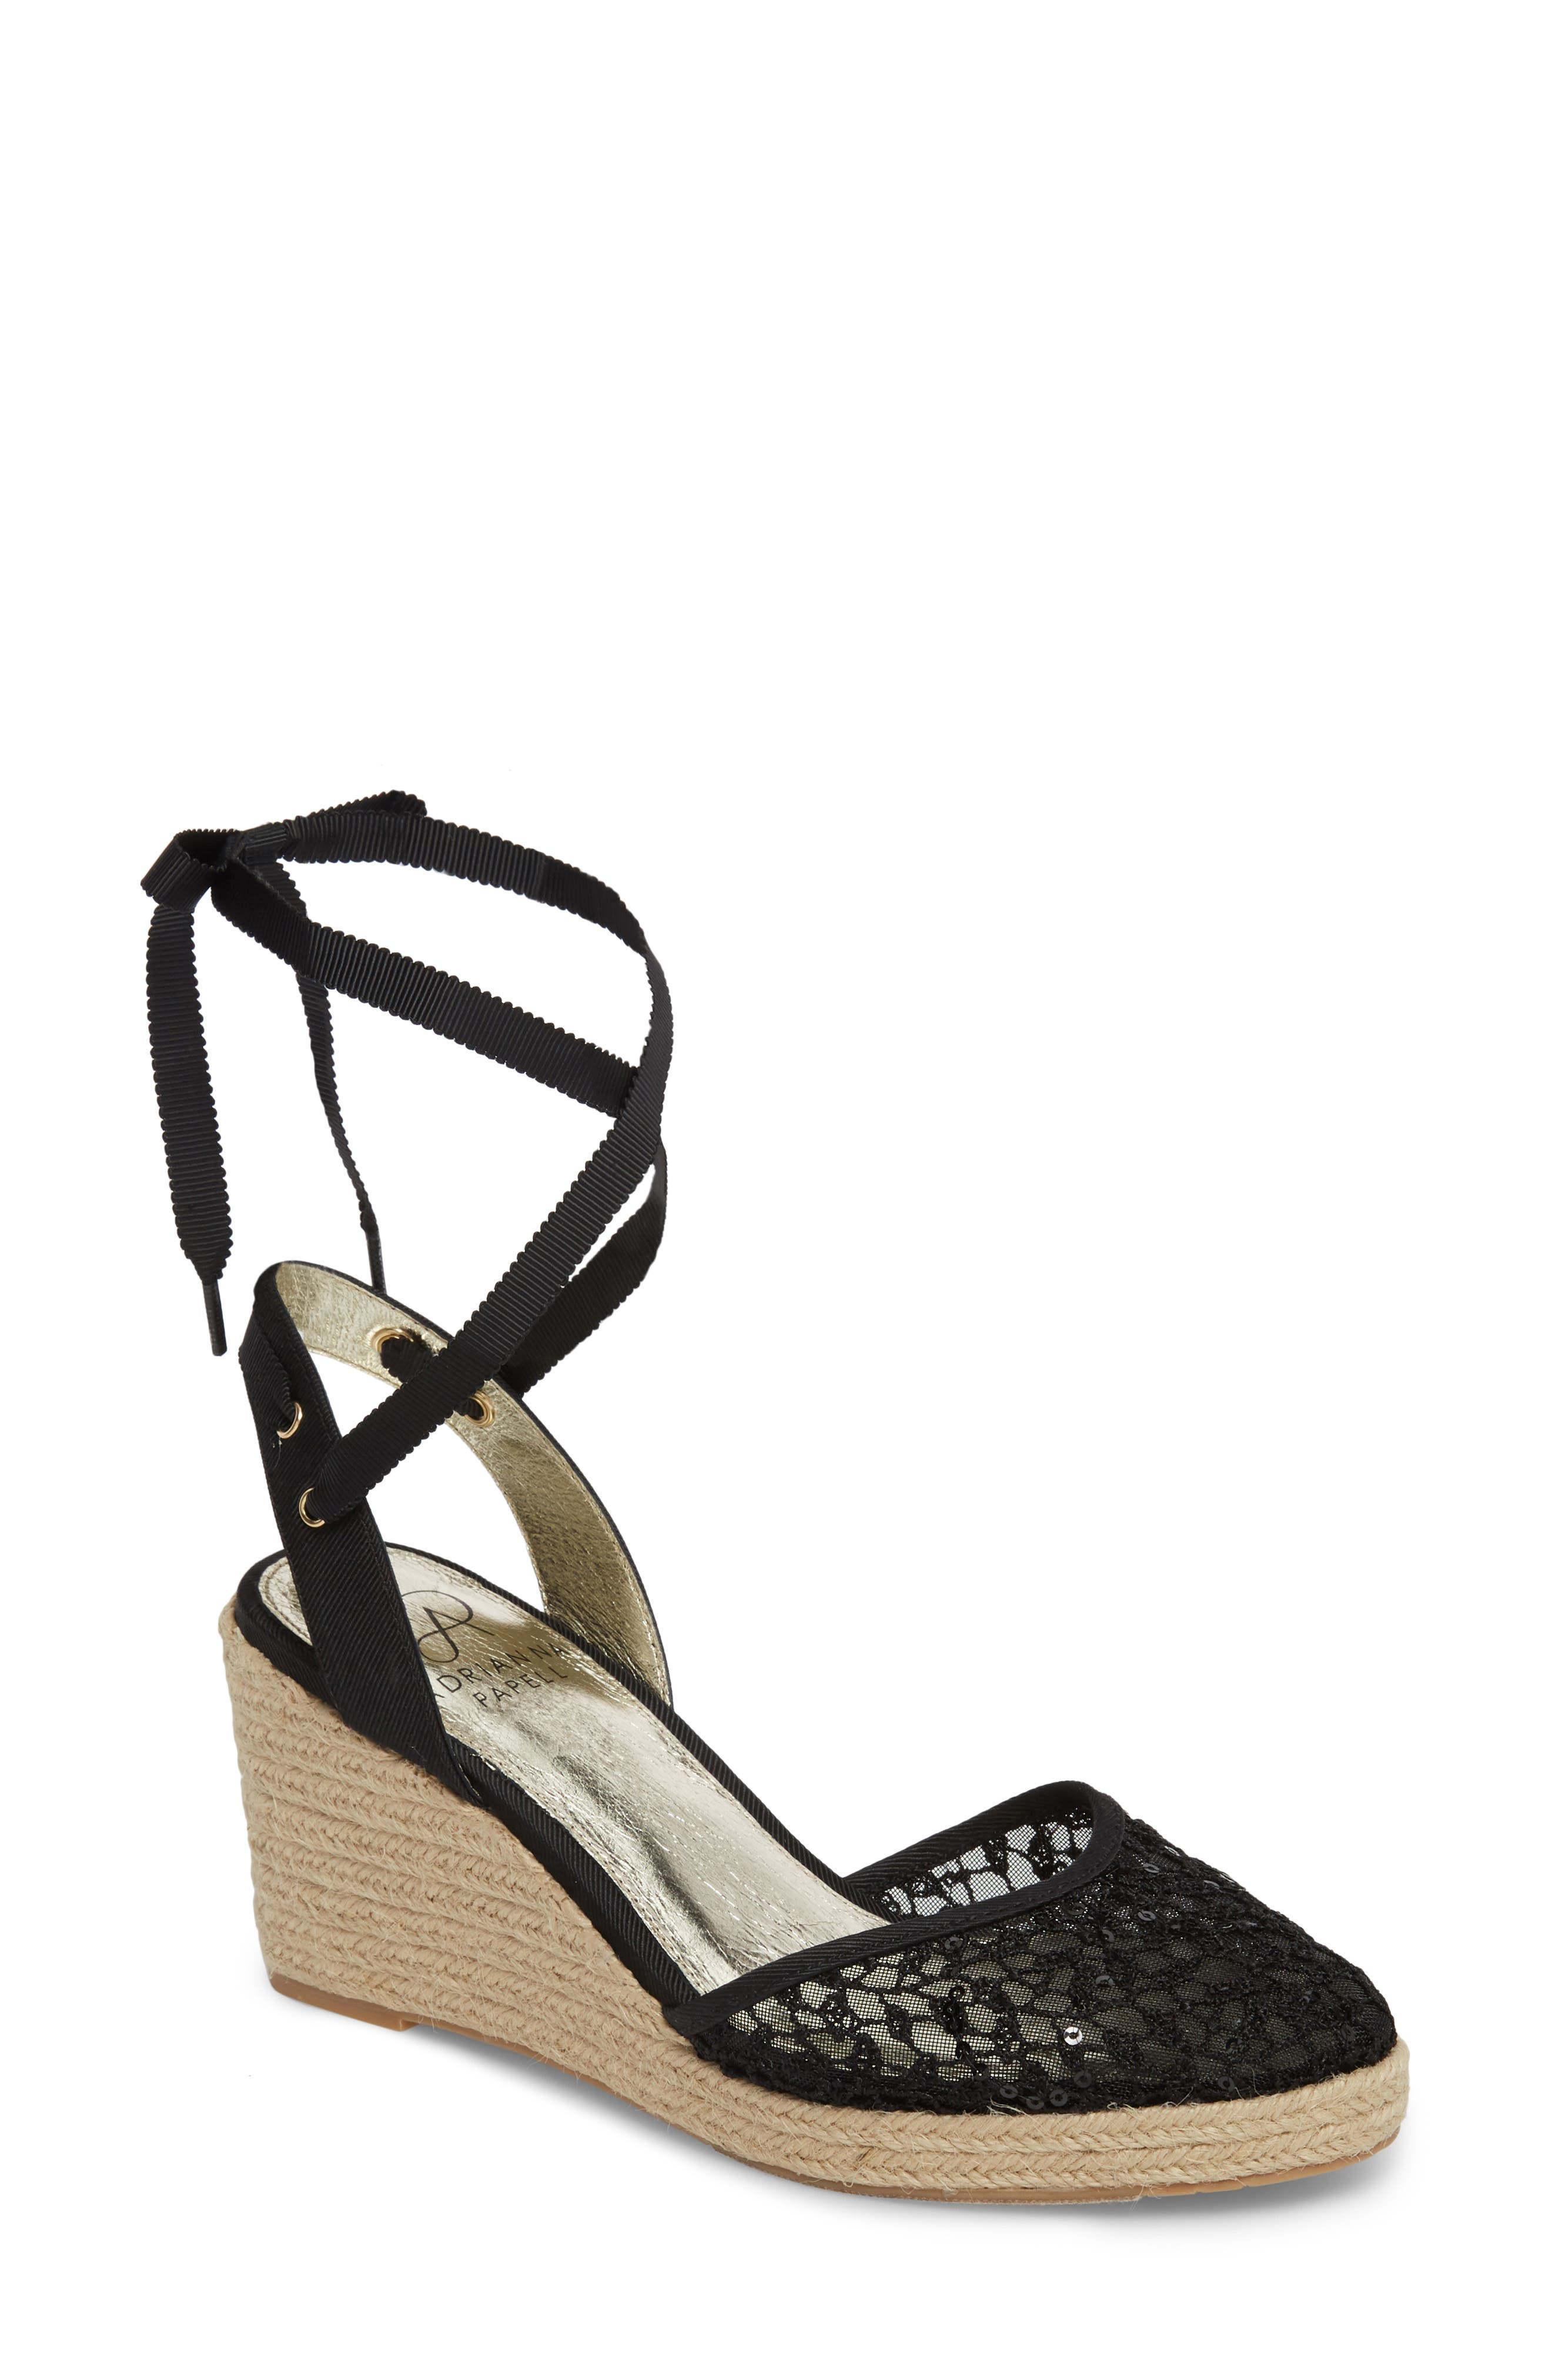 ADRIANNA PAPELL Pamela Espadrille Wedge Sandal, Main, color, BLACK LACE FABRIC